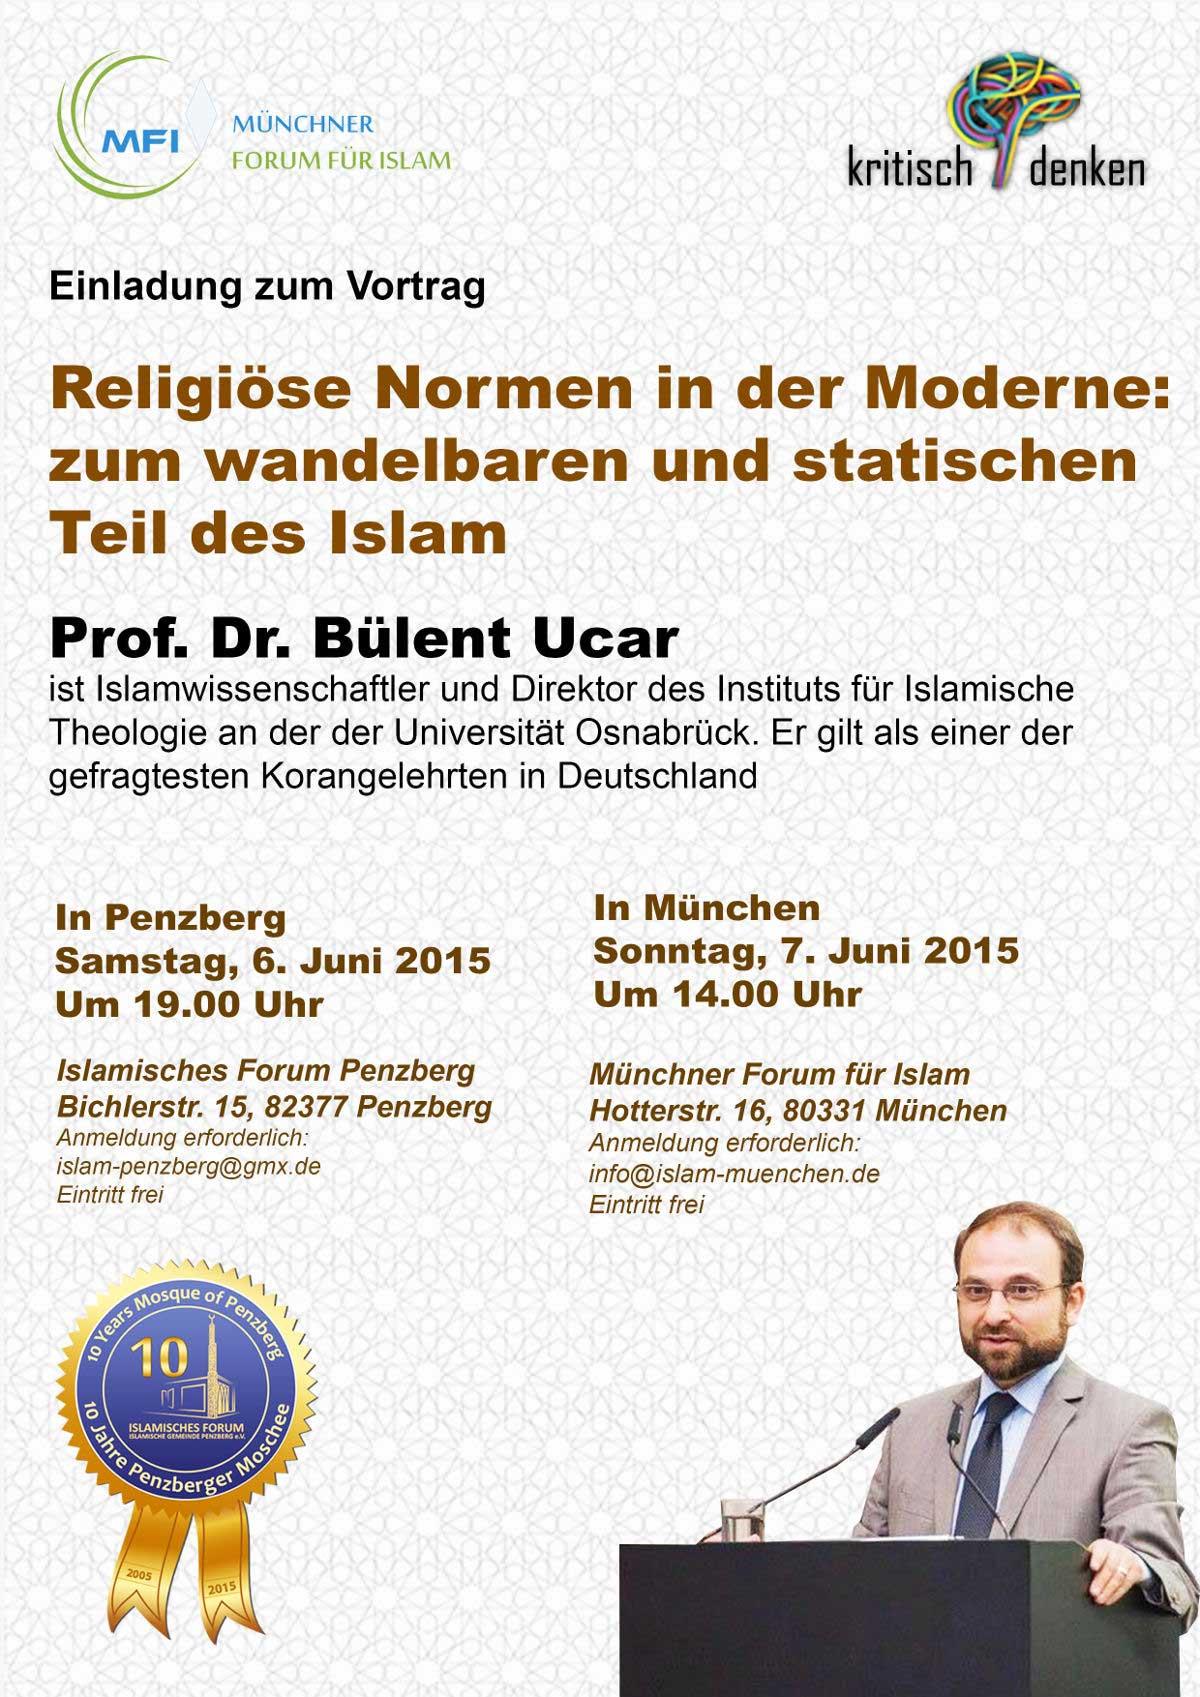 IGP Veranstaltung: Vortrag von Prof. Dr. Bülent Ucar